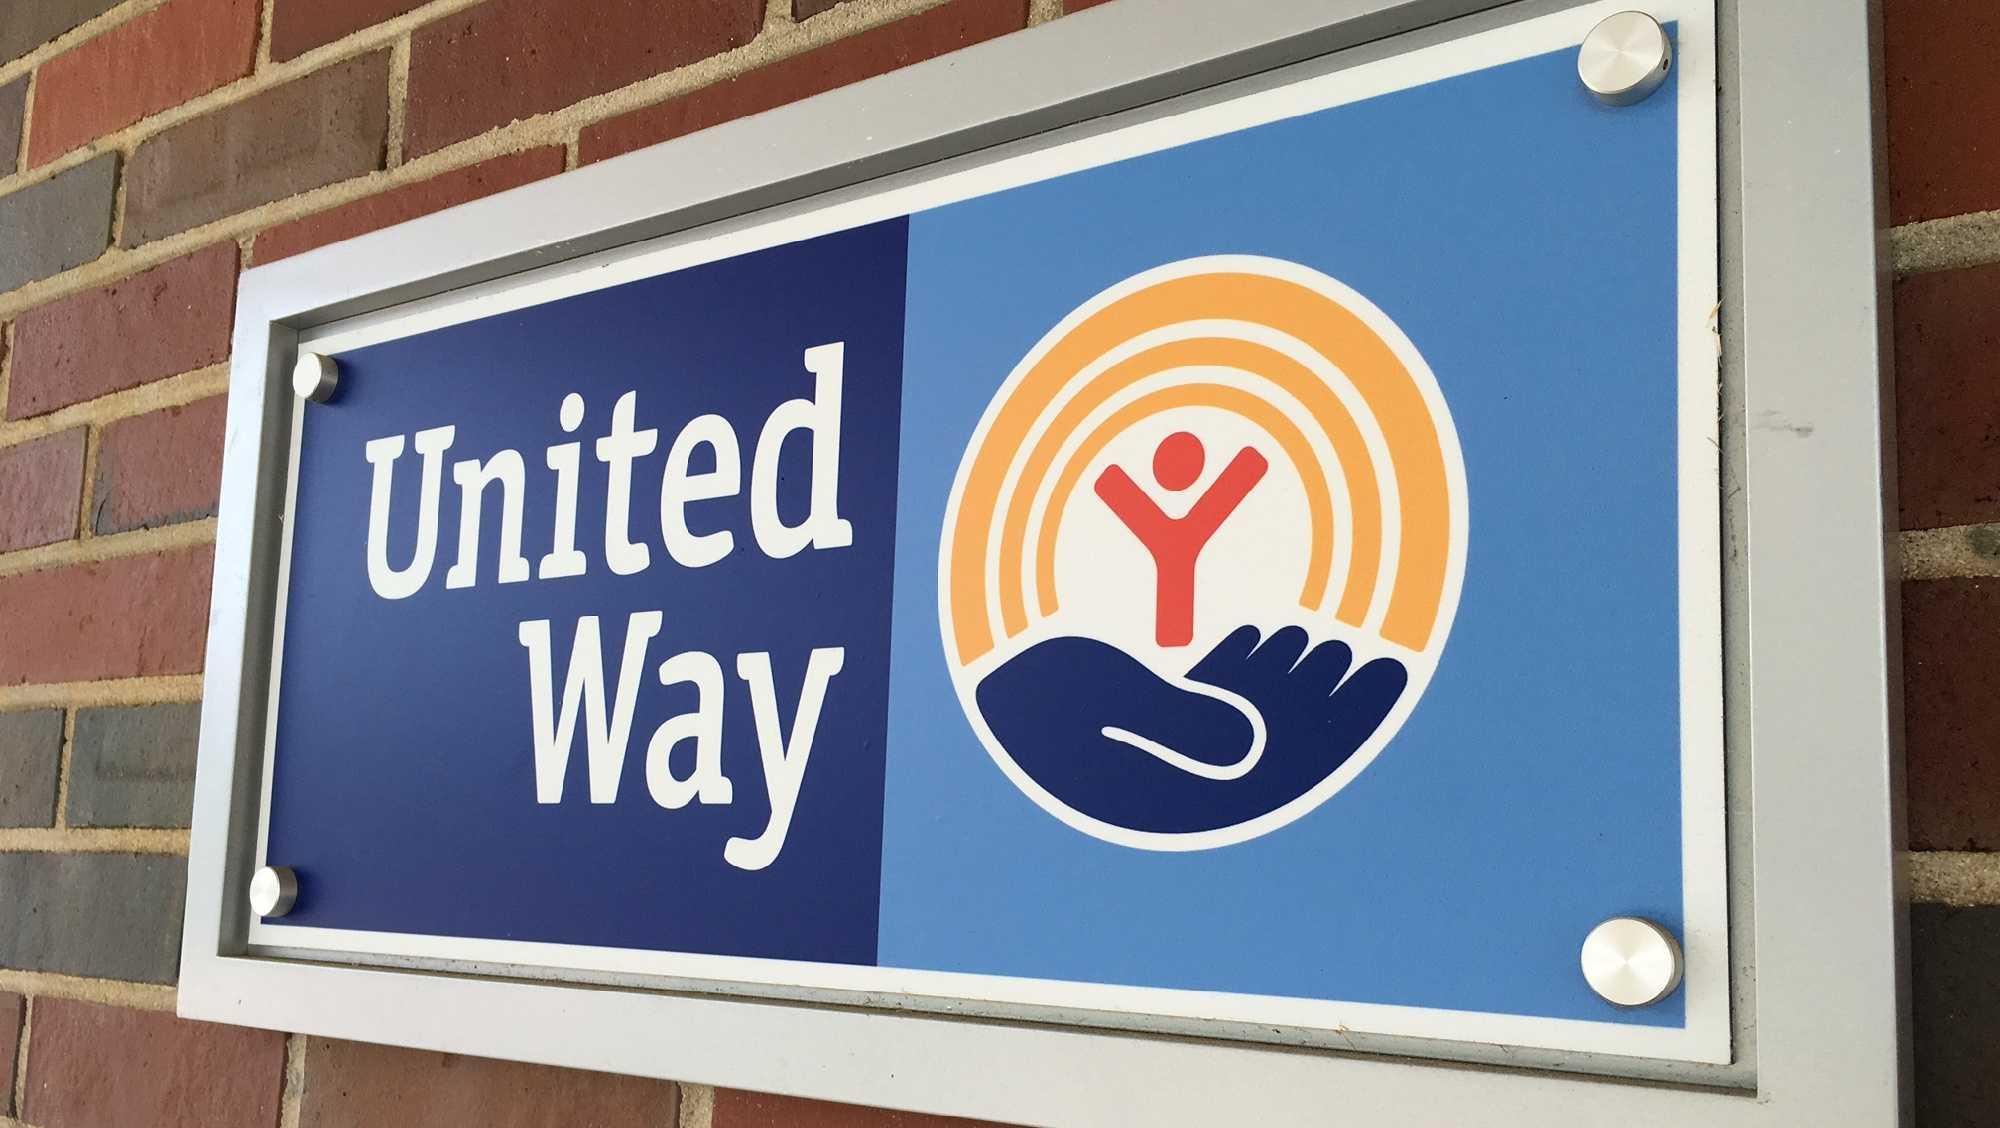 united way wvtm.JPG